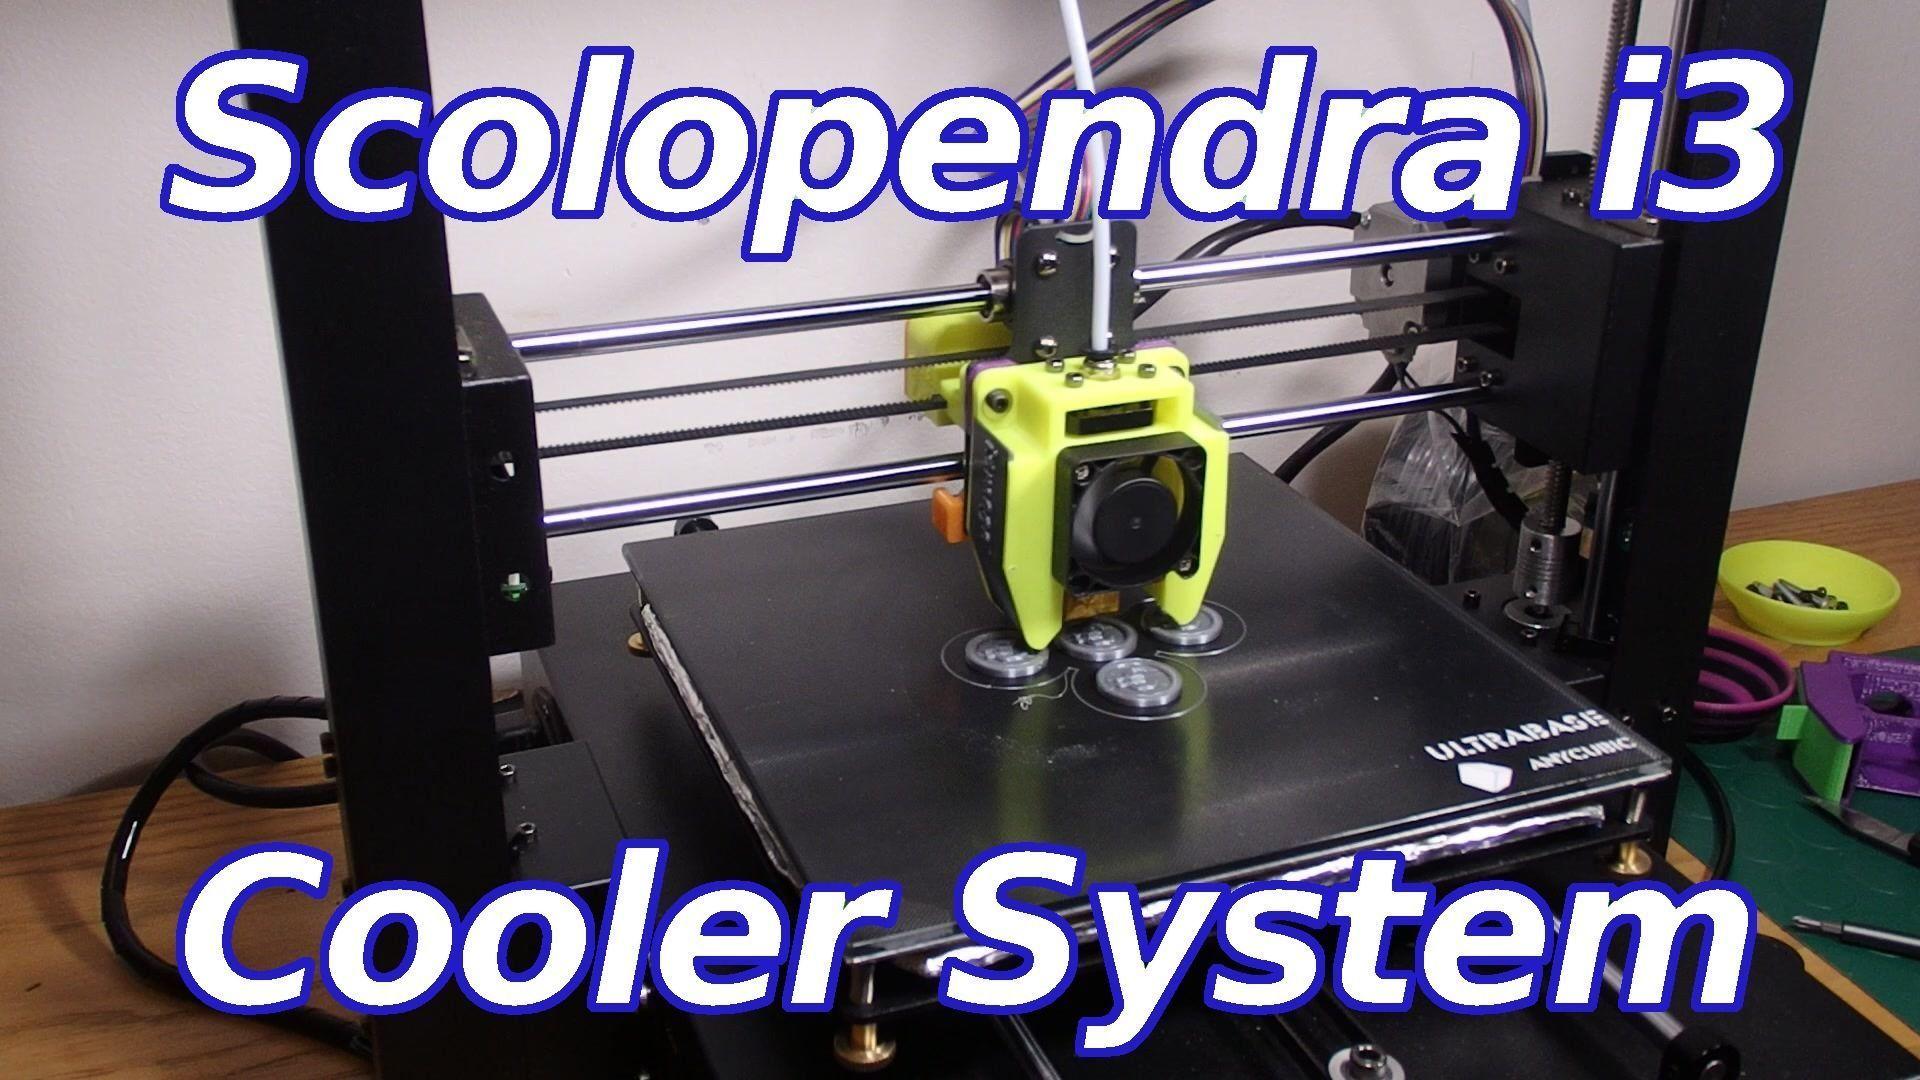 E3Dv5 - Scolopendra i3 Cooler for i3mega and other